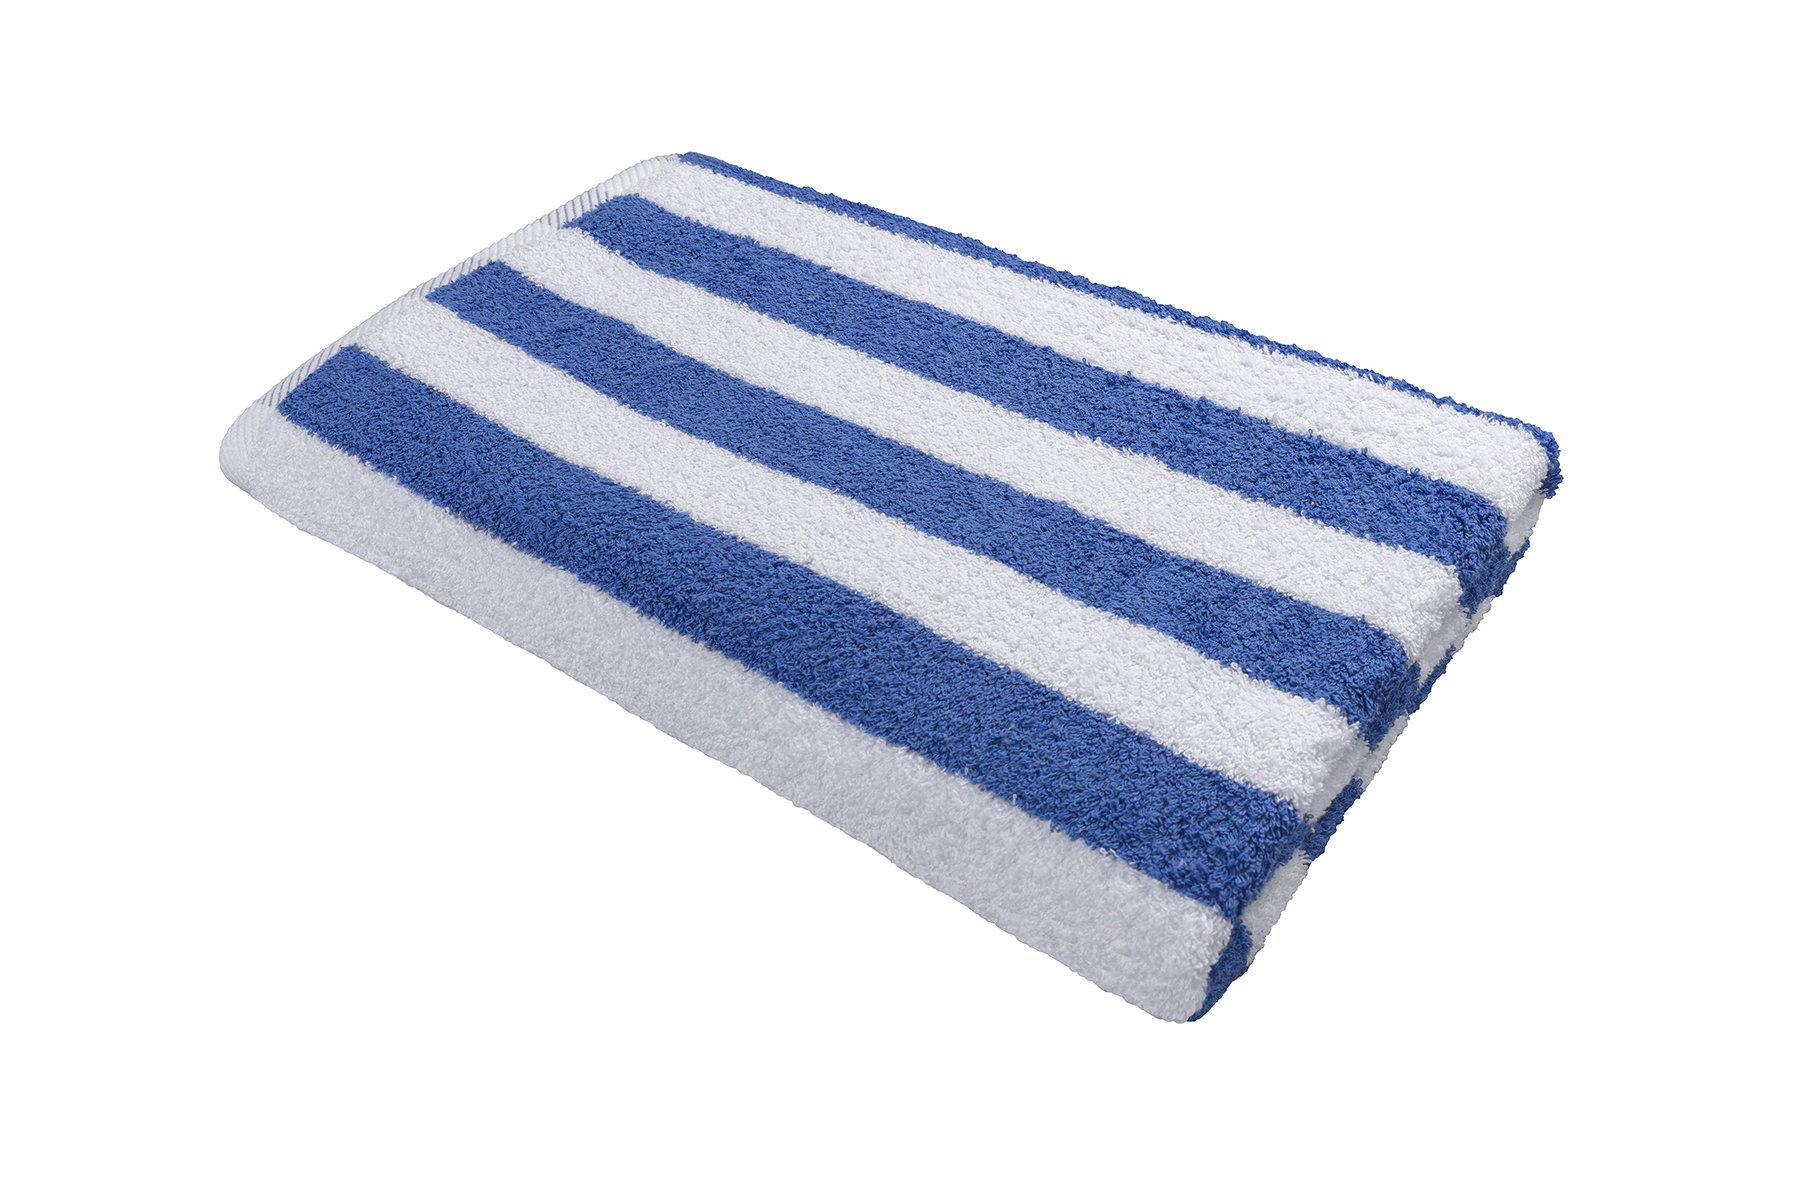 Splash Pool Towel - Hotel & Resort Extra Large Pool Towels for Pool, Beach, Spa, Gym - Blue Cabana Stripes - 100% Premium XL Cotton Towel (35''x 70'', Blue Cabana Stripe)